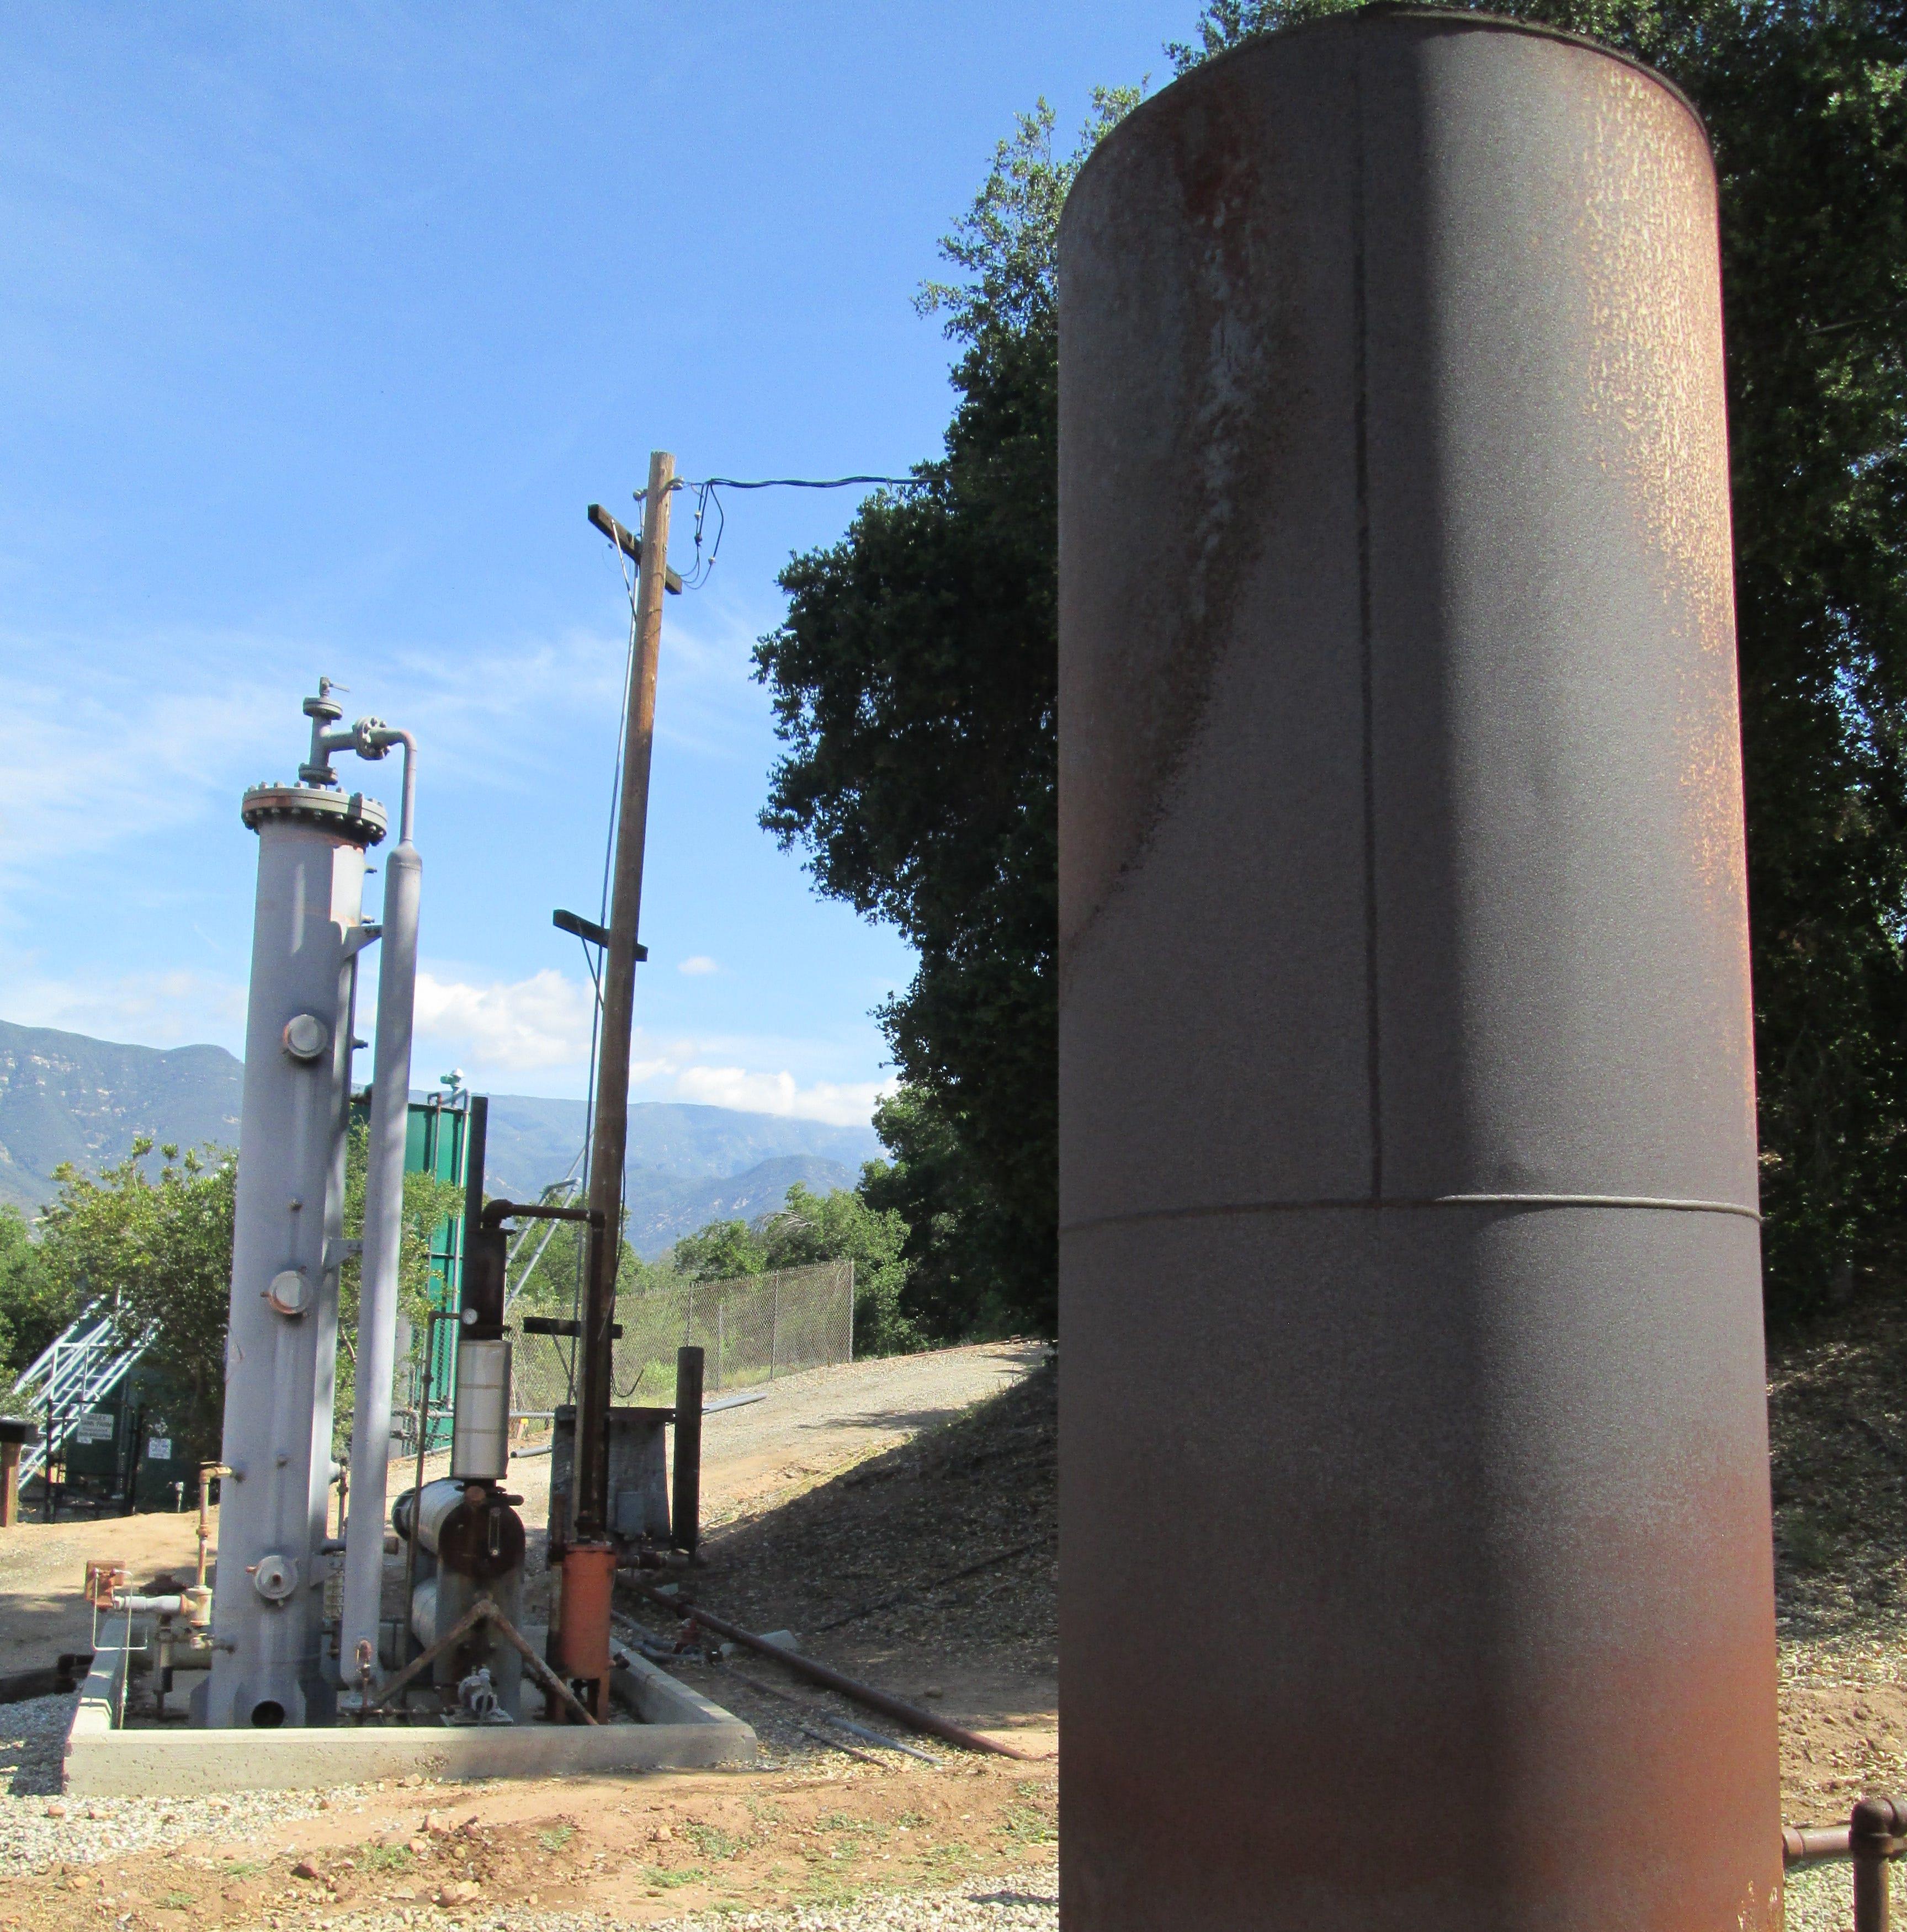 Ojai loses bid to delay 20-year permit for oil operation as county board splits 3-2